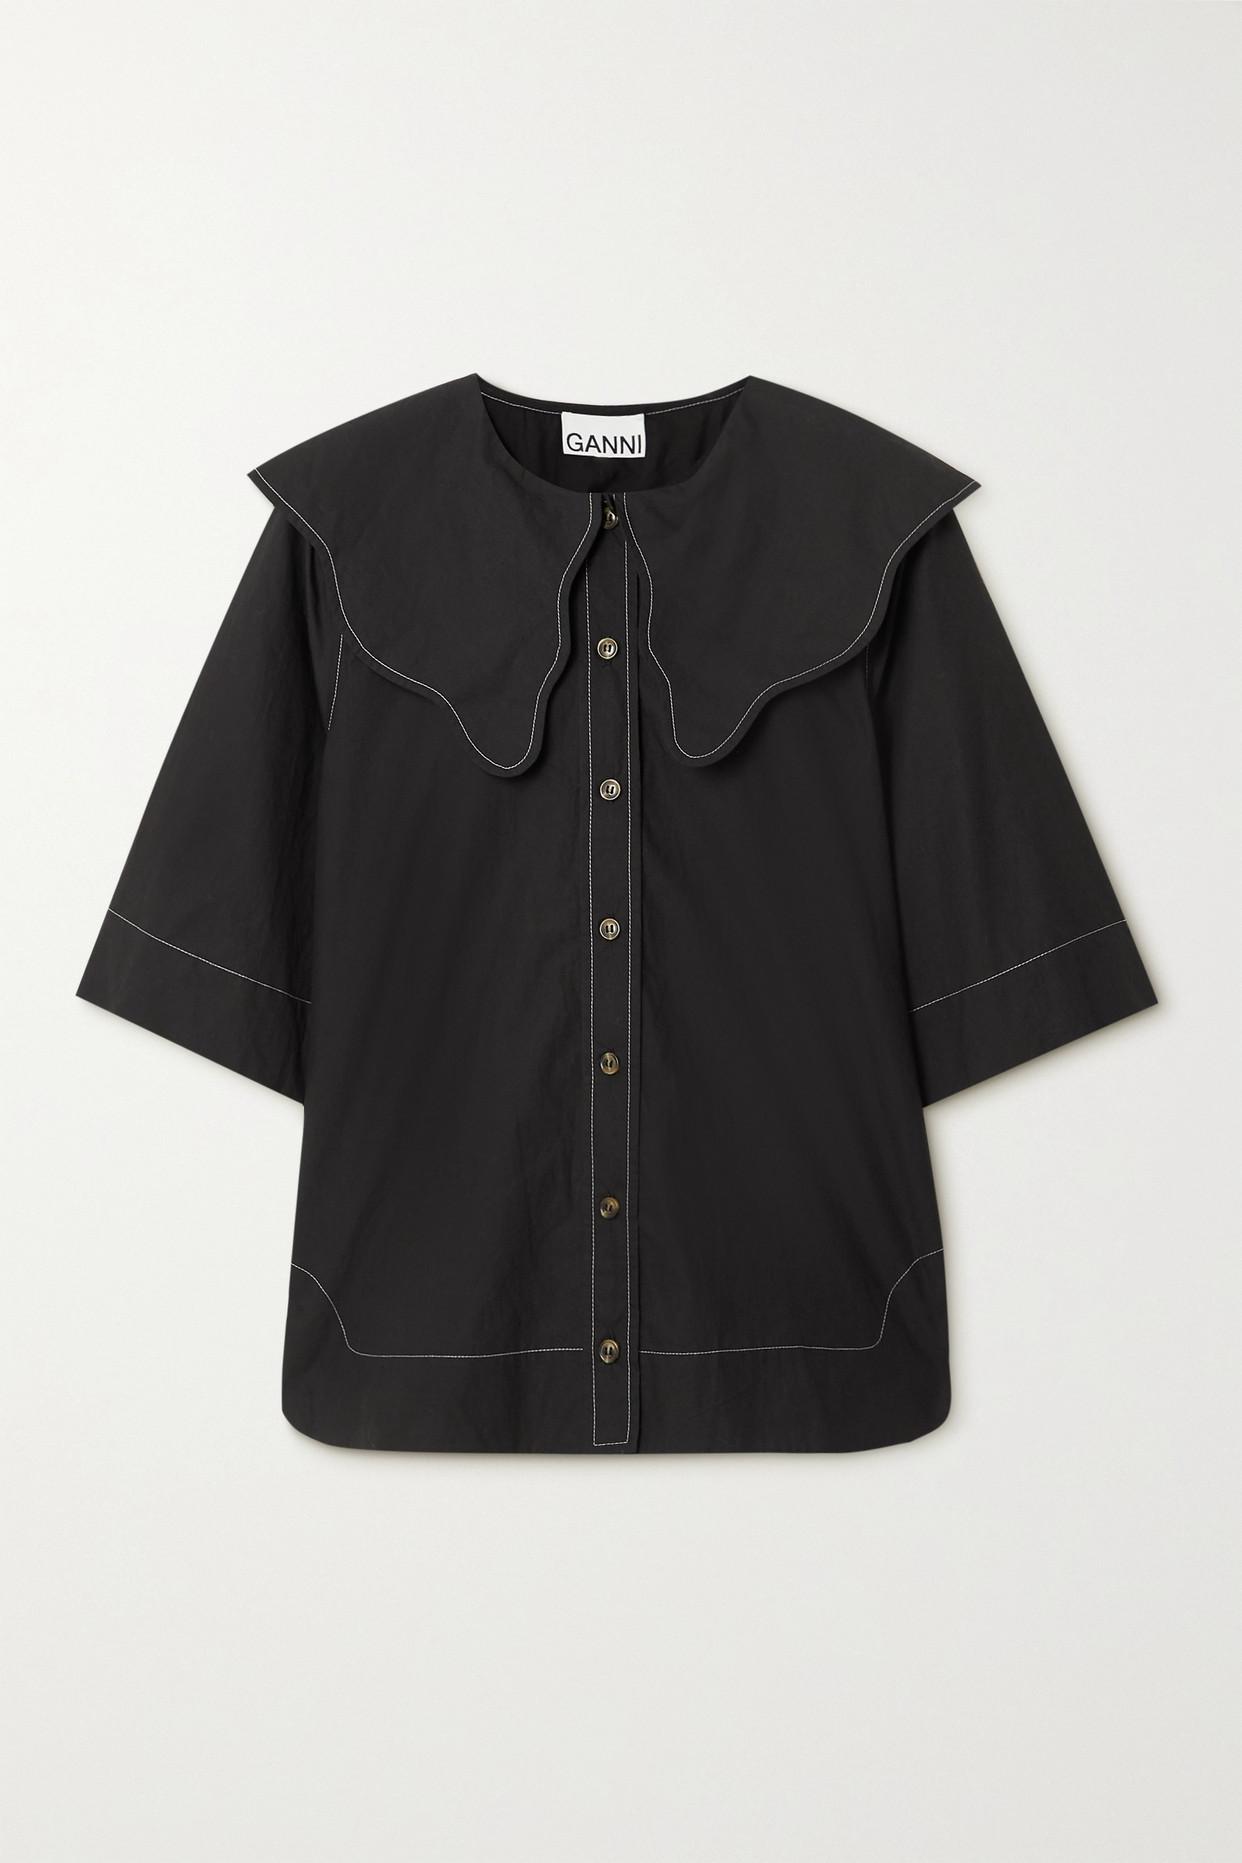 Ganni Organic Cotton-poplin Shirt In Black